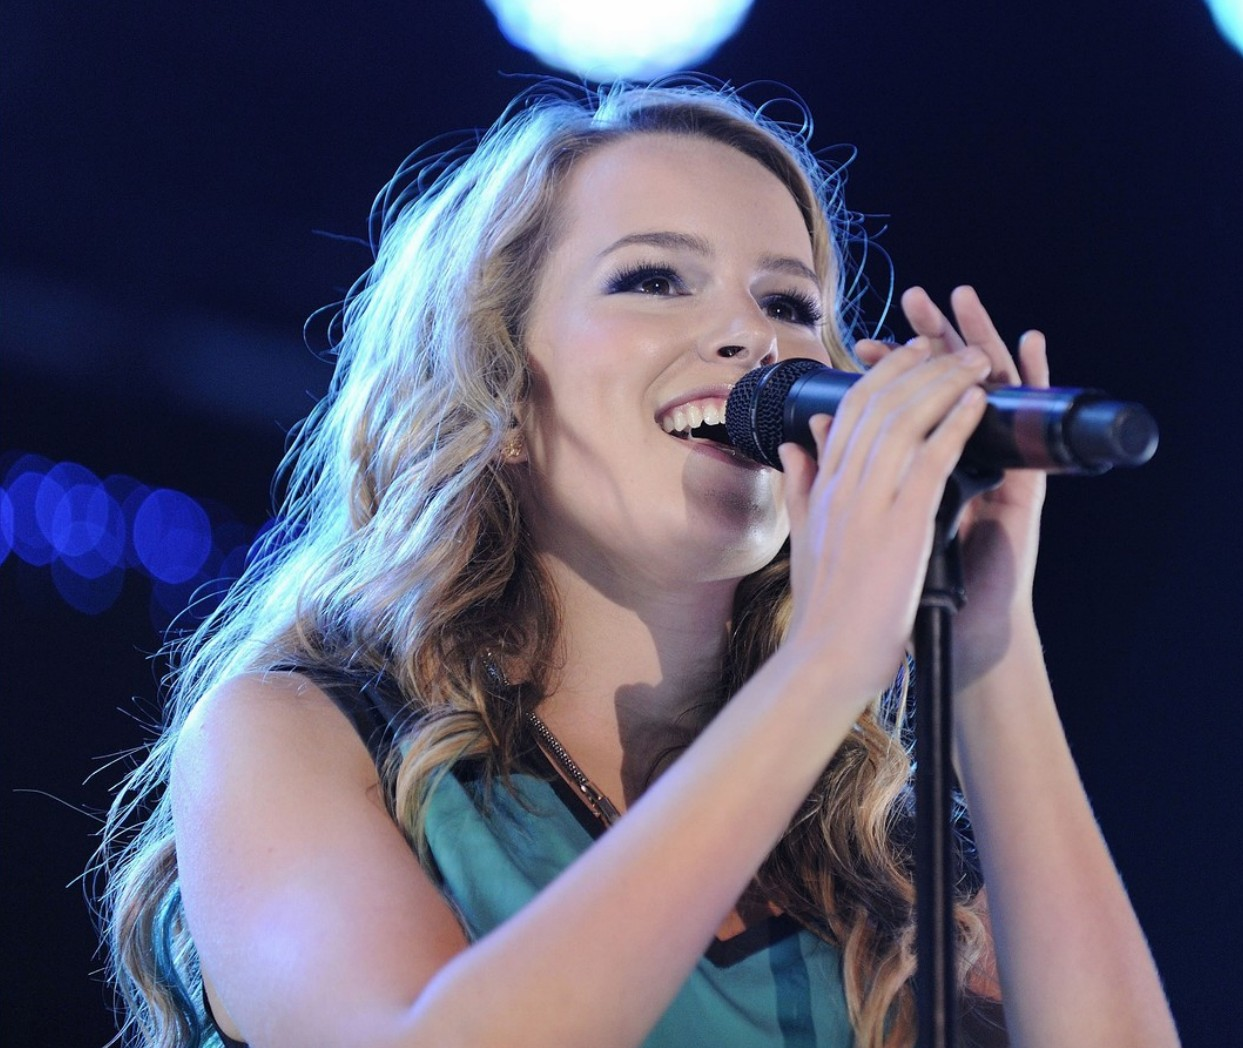 Bridgit_Mendler_Performance_Toronto_August_26_2012_ (16).jpg